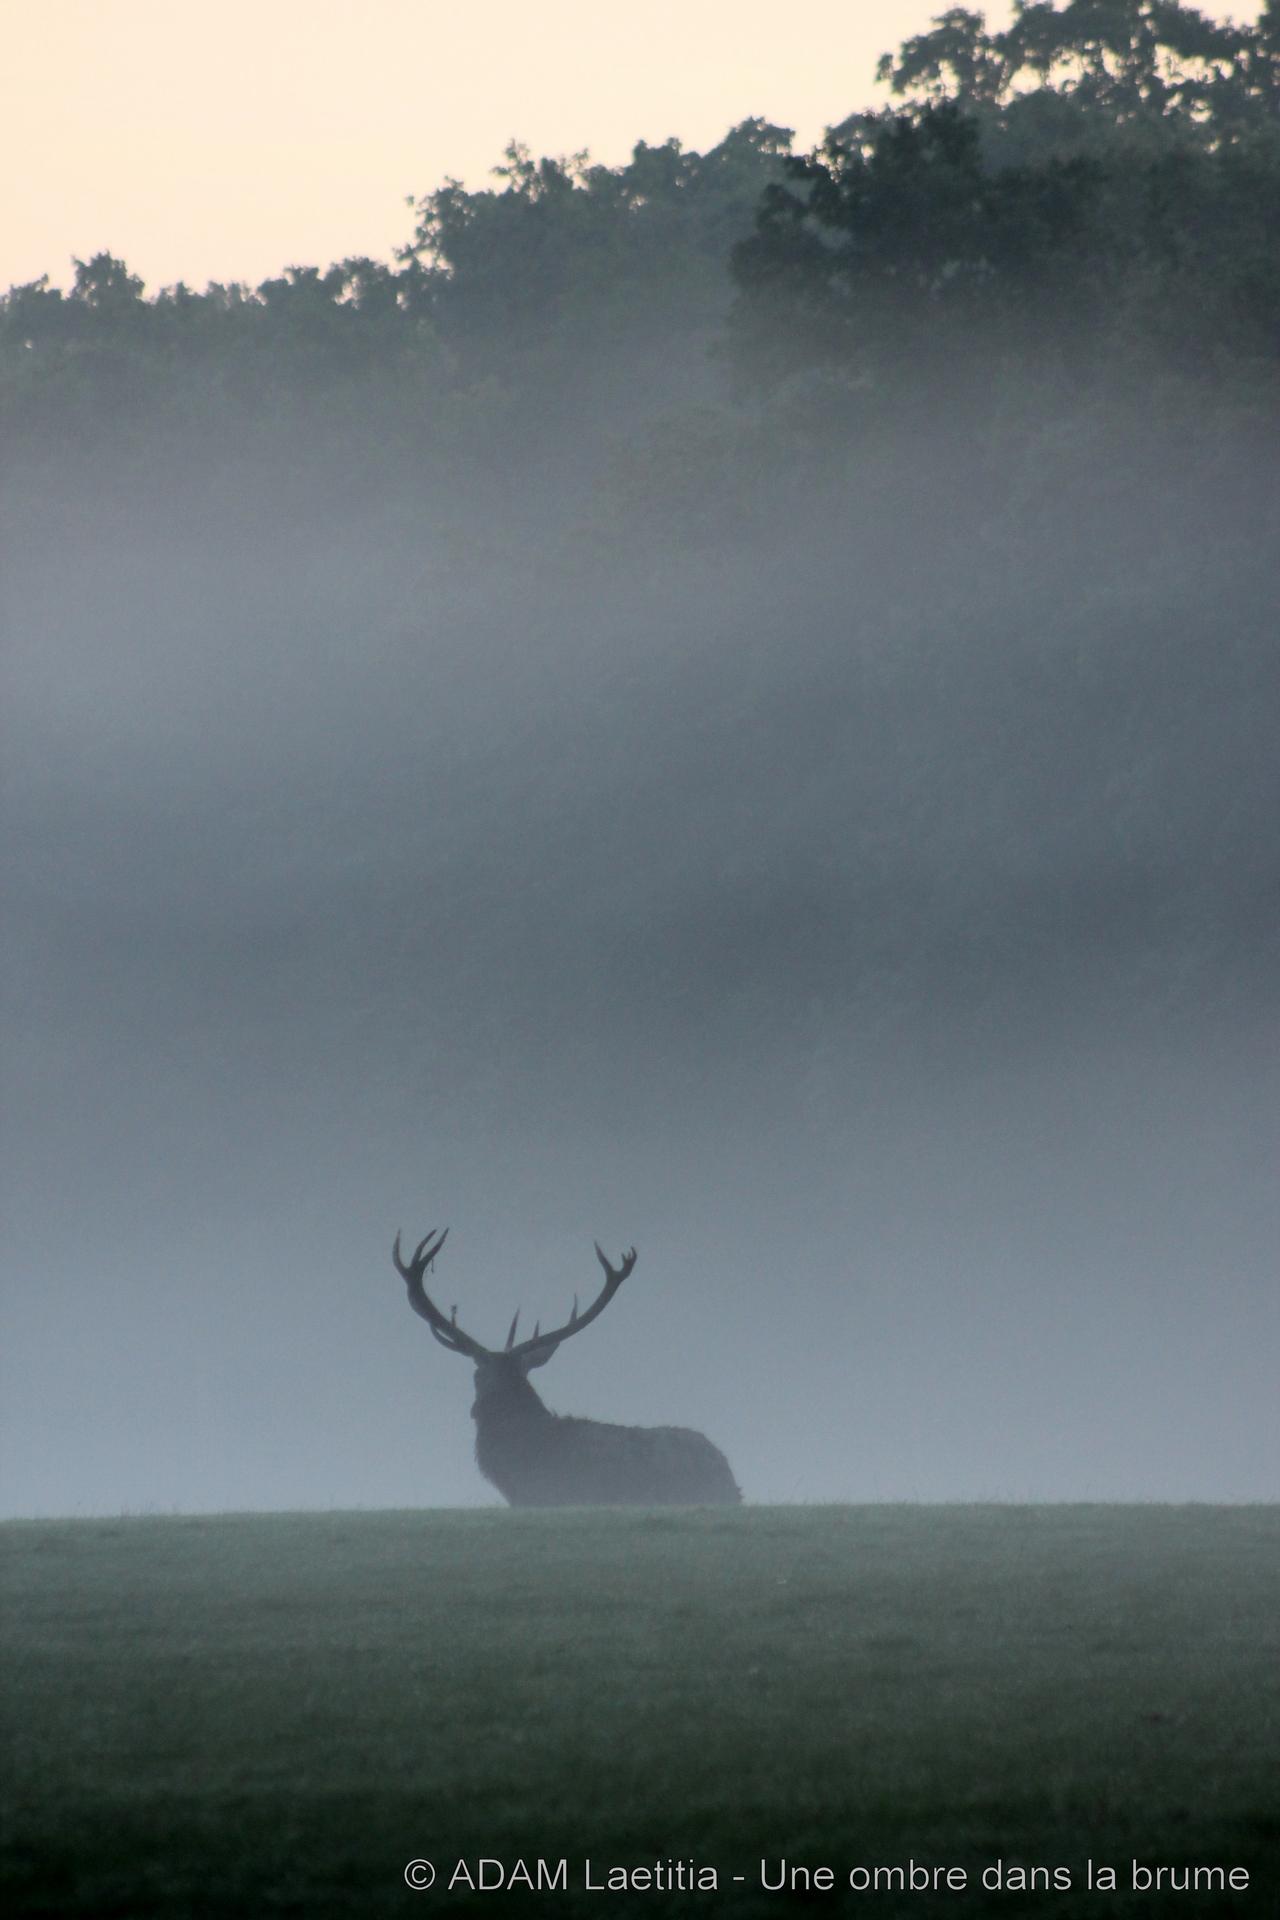 ADAM - Une ombre dans la brume (-)